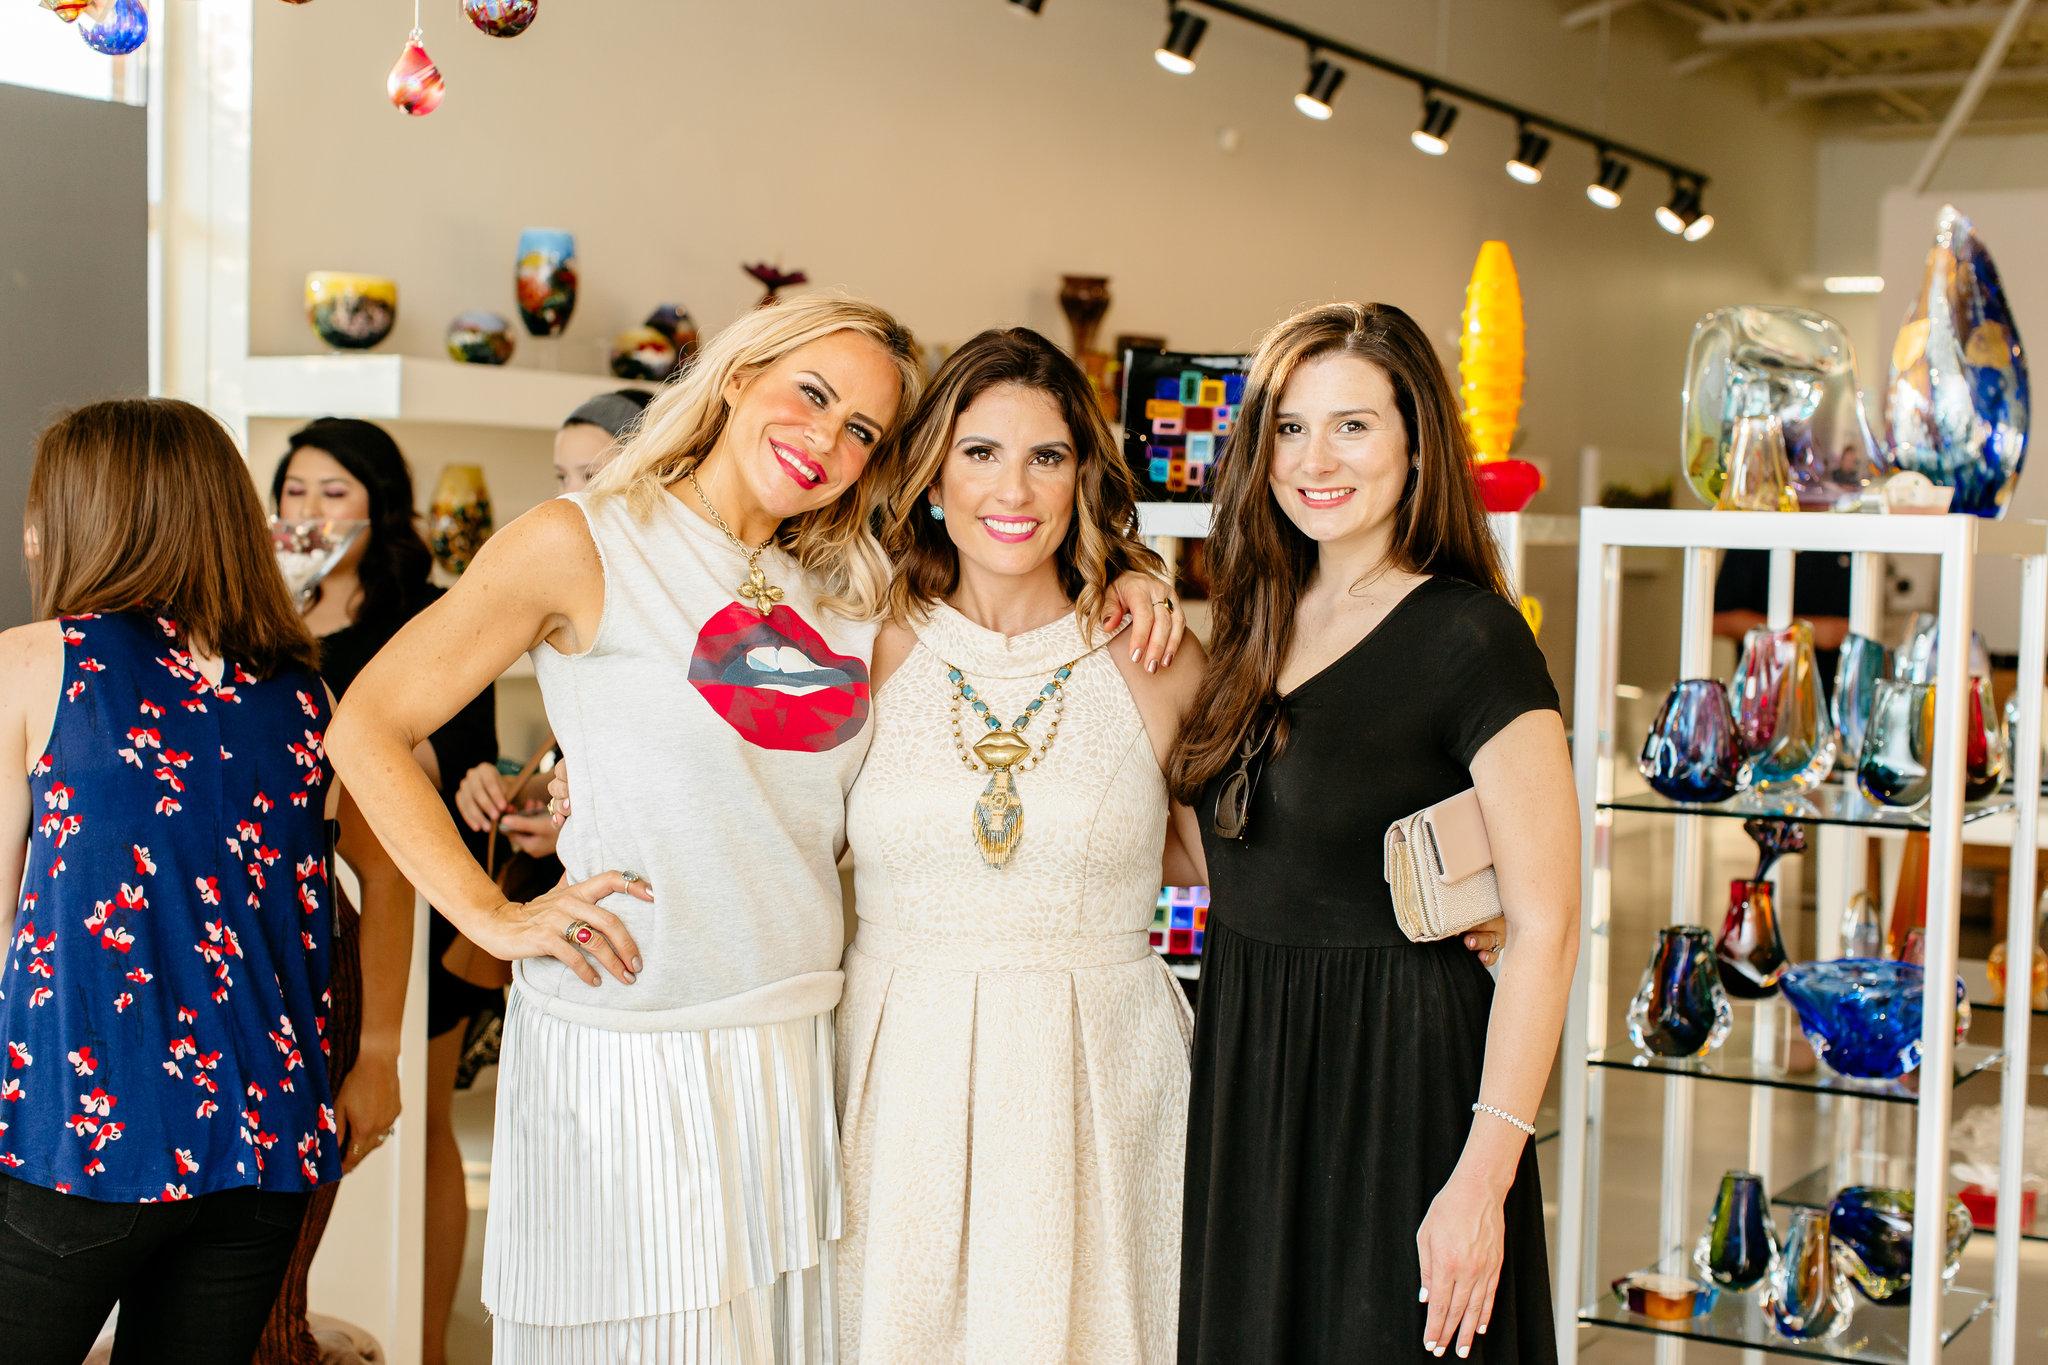 Alexa-Vossler-Photo_Dallas-Event-Photographer_Brite-Bar-Beauty-2018-Lipstick-Launch-Party-151.jpg